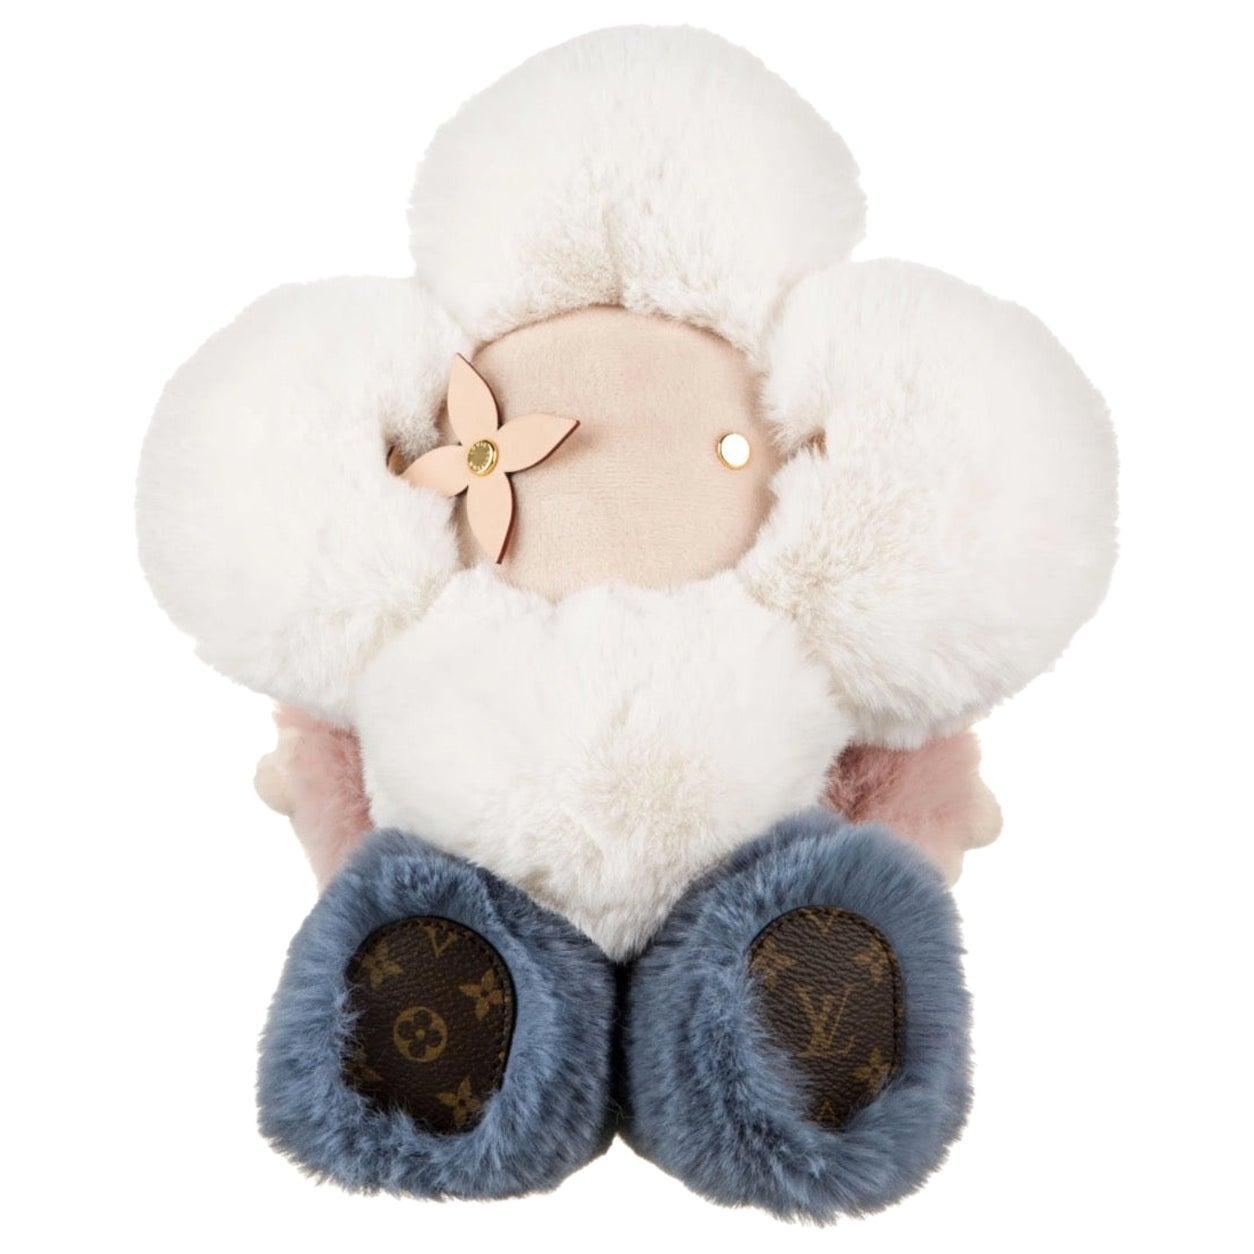 Louis Vuitton NEW Pink Blue White Monogram Figurine Decorative Bear Toy in Box